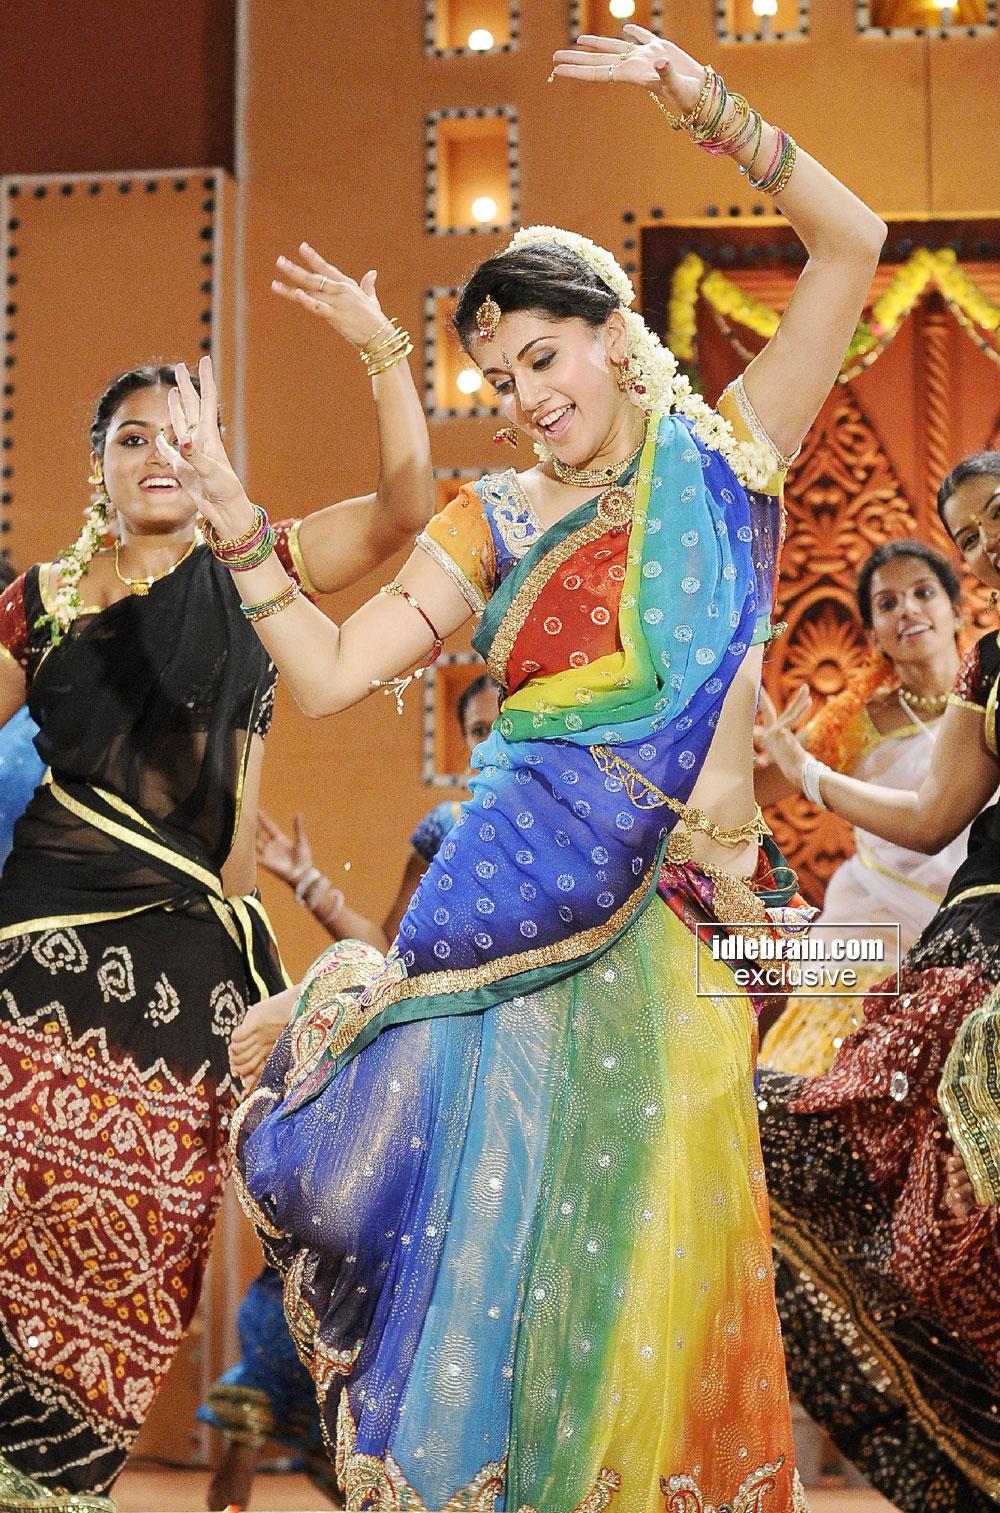 , Tapsee Pannu Dancing In Colorful Saree